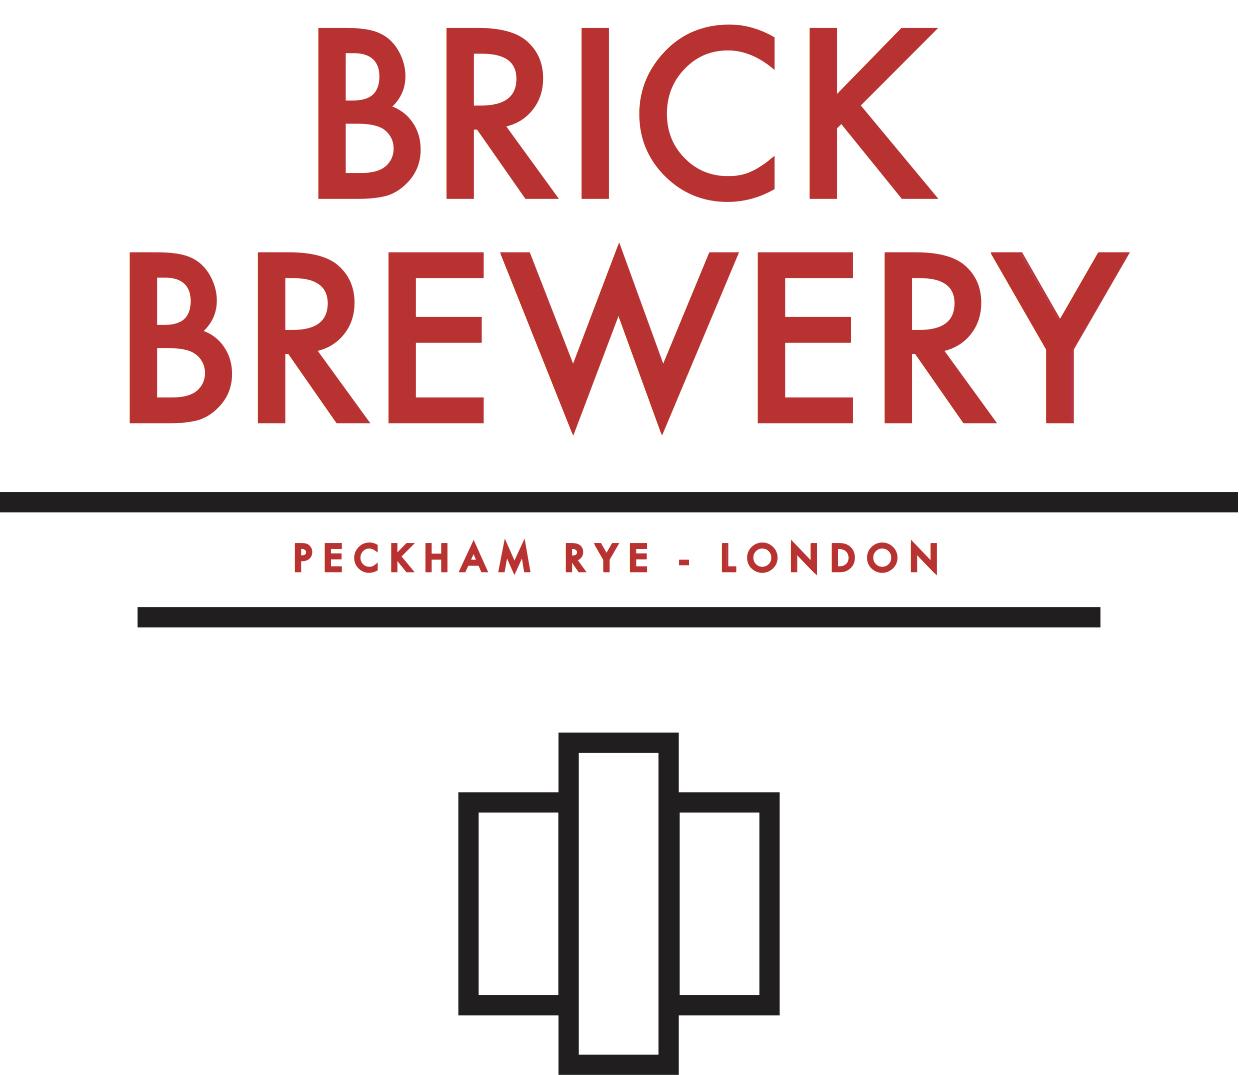 Brick Brewery Stacked logo CMYK.jpg